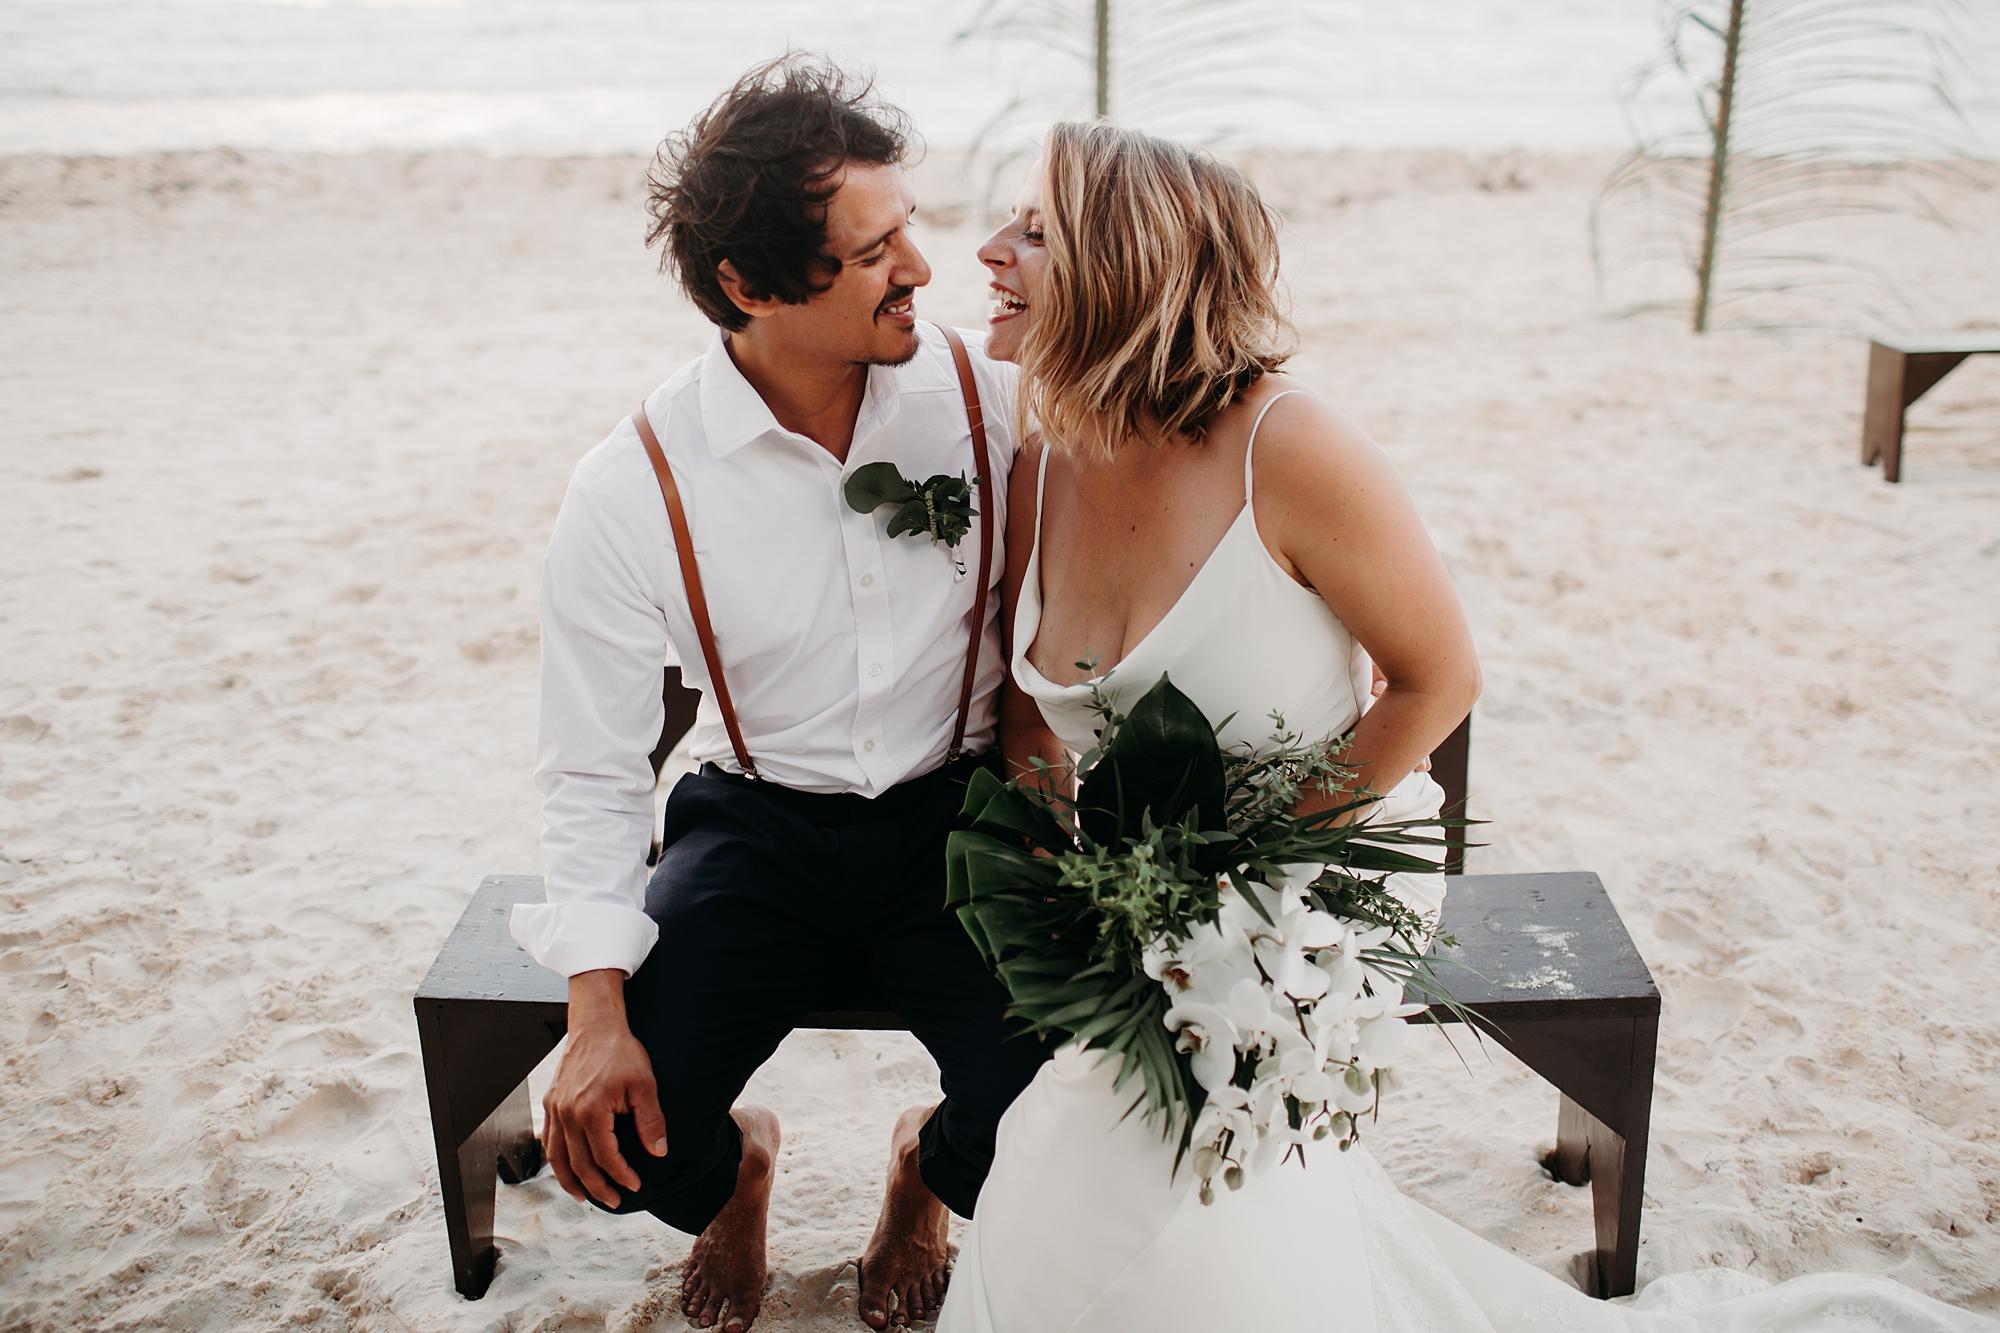 Danielle-San-Antonio-Wedding-Photographer-233_WEB.jpg